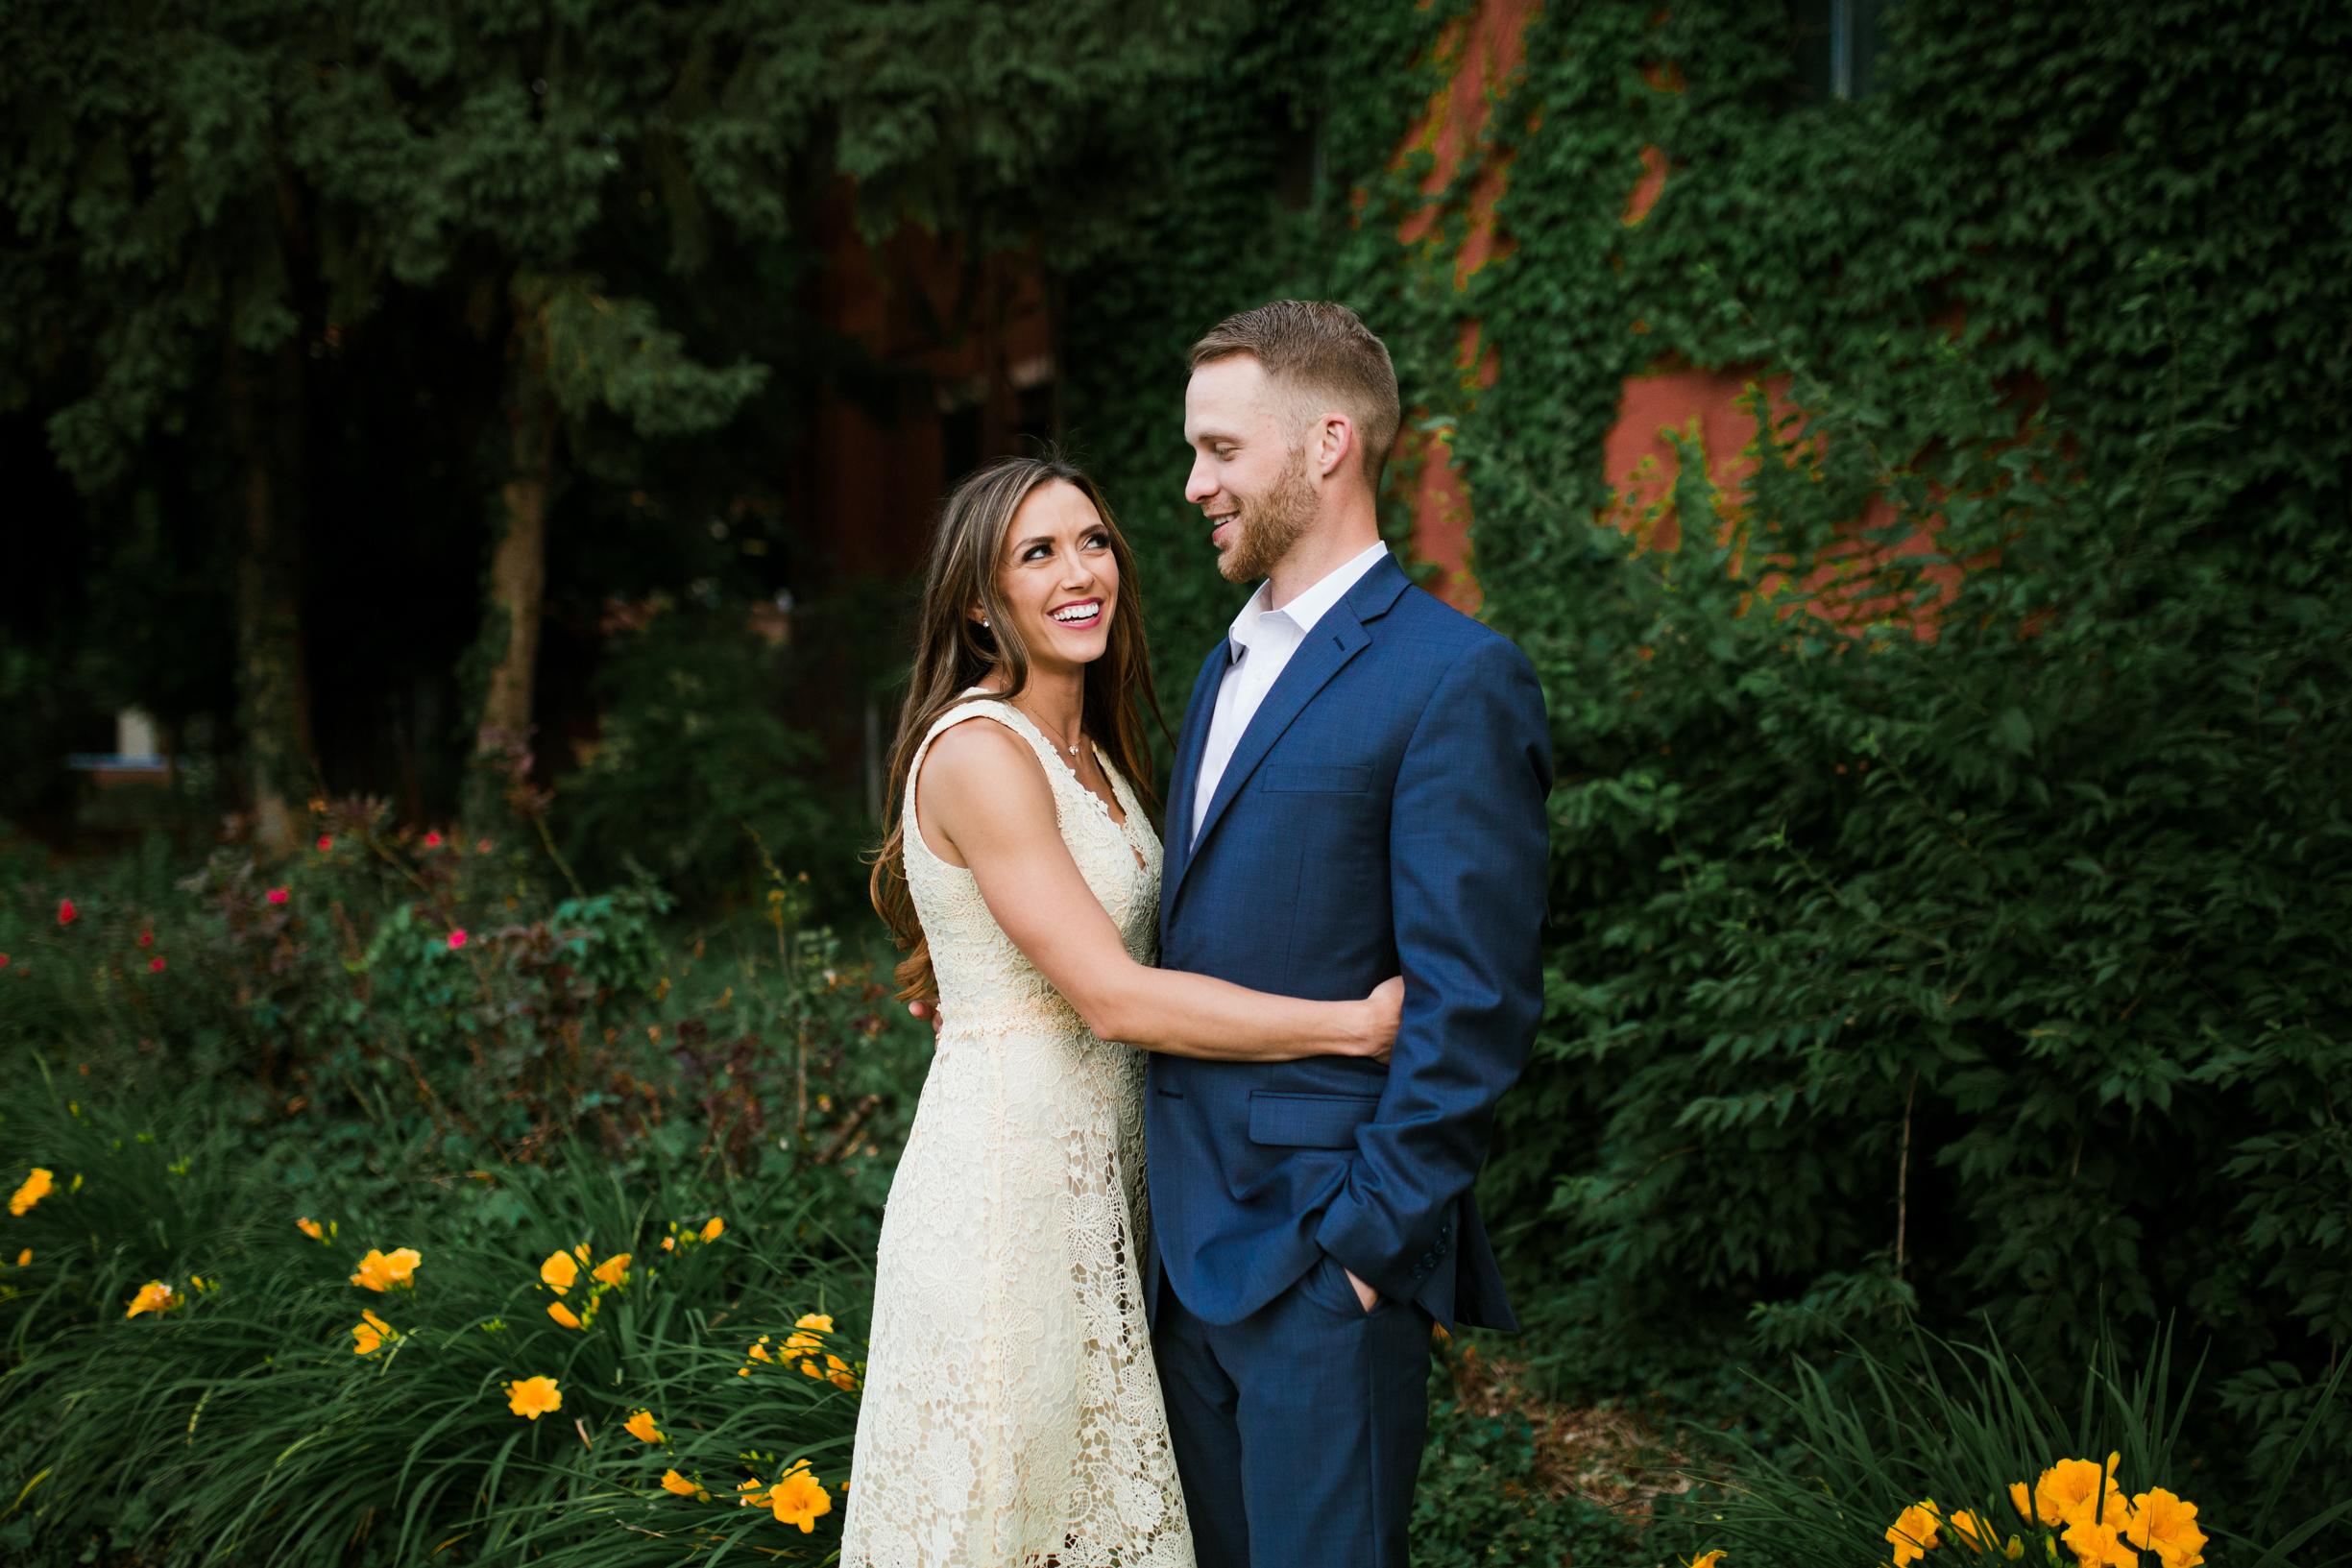 Victoria & Chad Engagement 2018 Crystal Ludwick Photo Louisville Kentucky Wedding Photographer WEBSITE (30 of 48).jpg